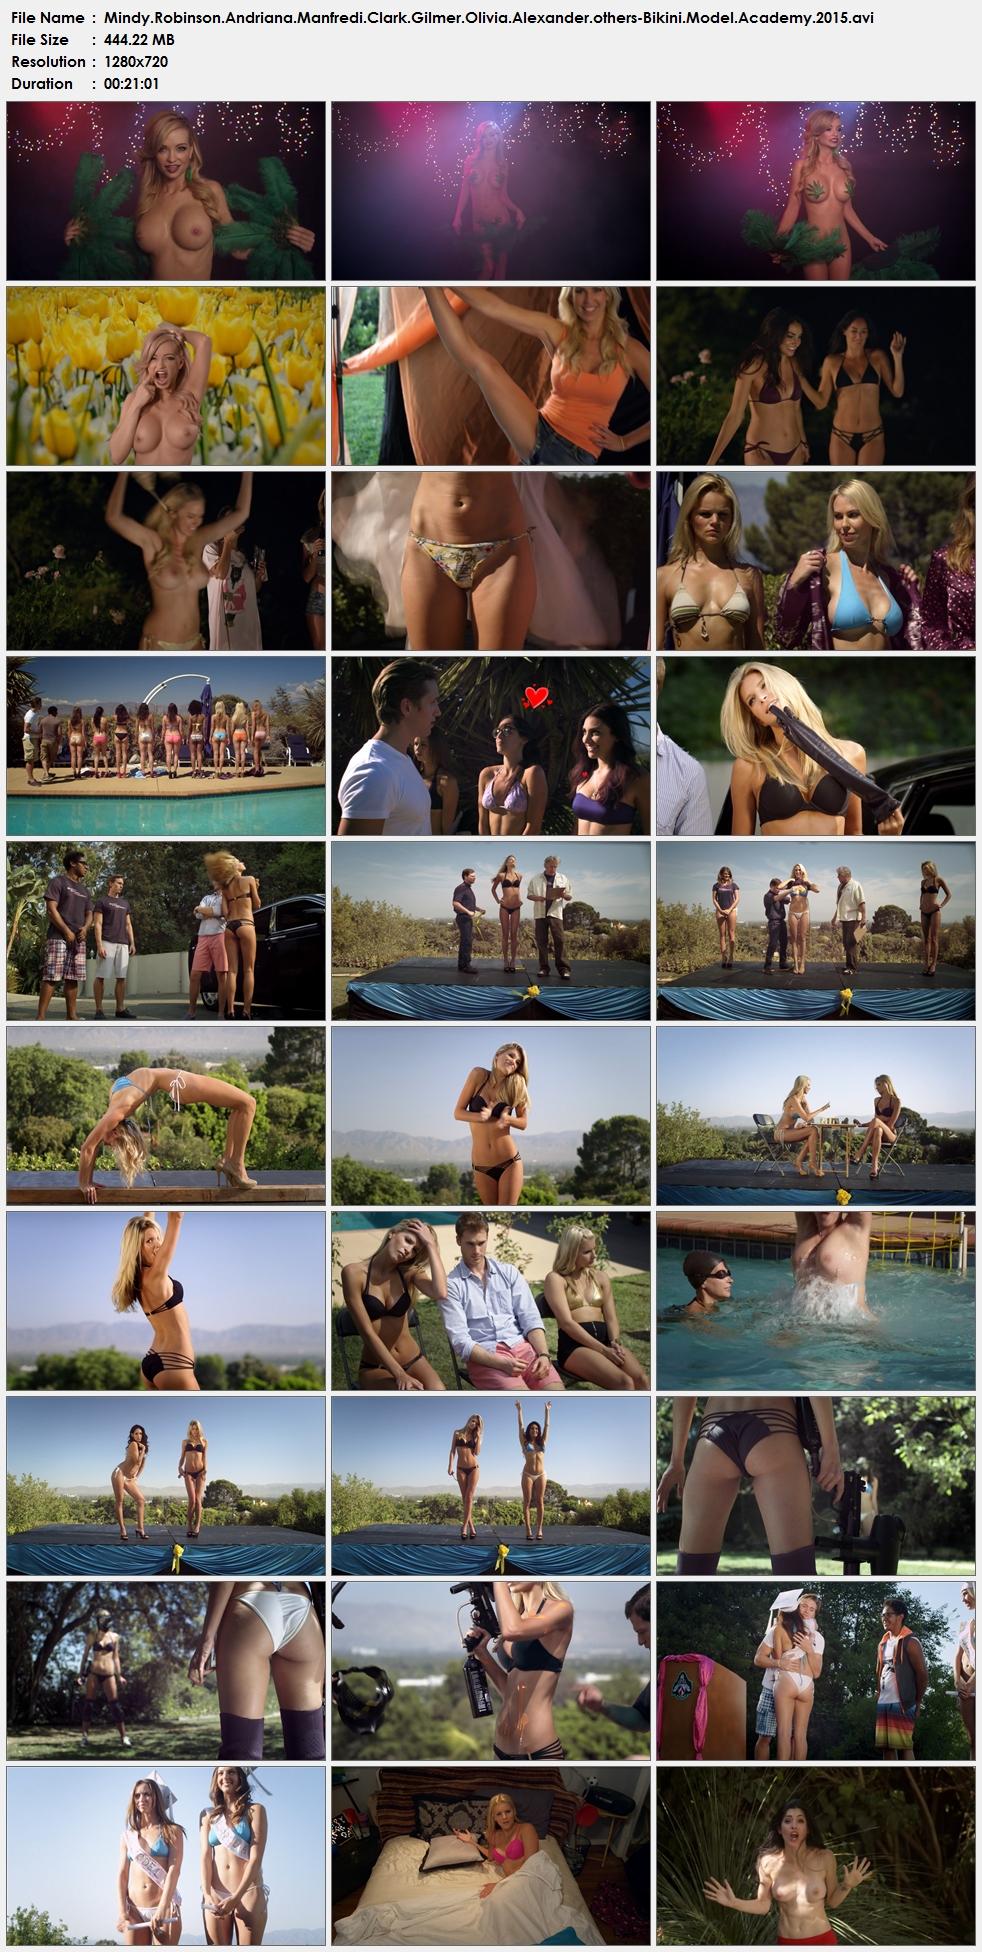 Mindy.Robinson.Andriana.Manfredi.Clark.Gilmer.Olivia.Alexander.others-Bikini.Model.Academy.2015.avi